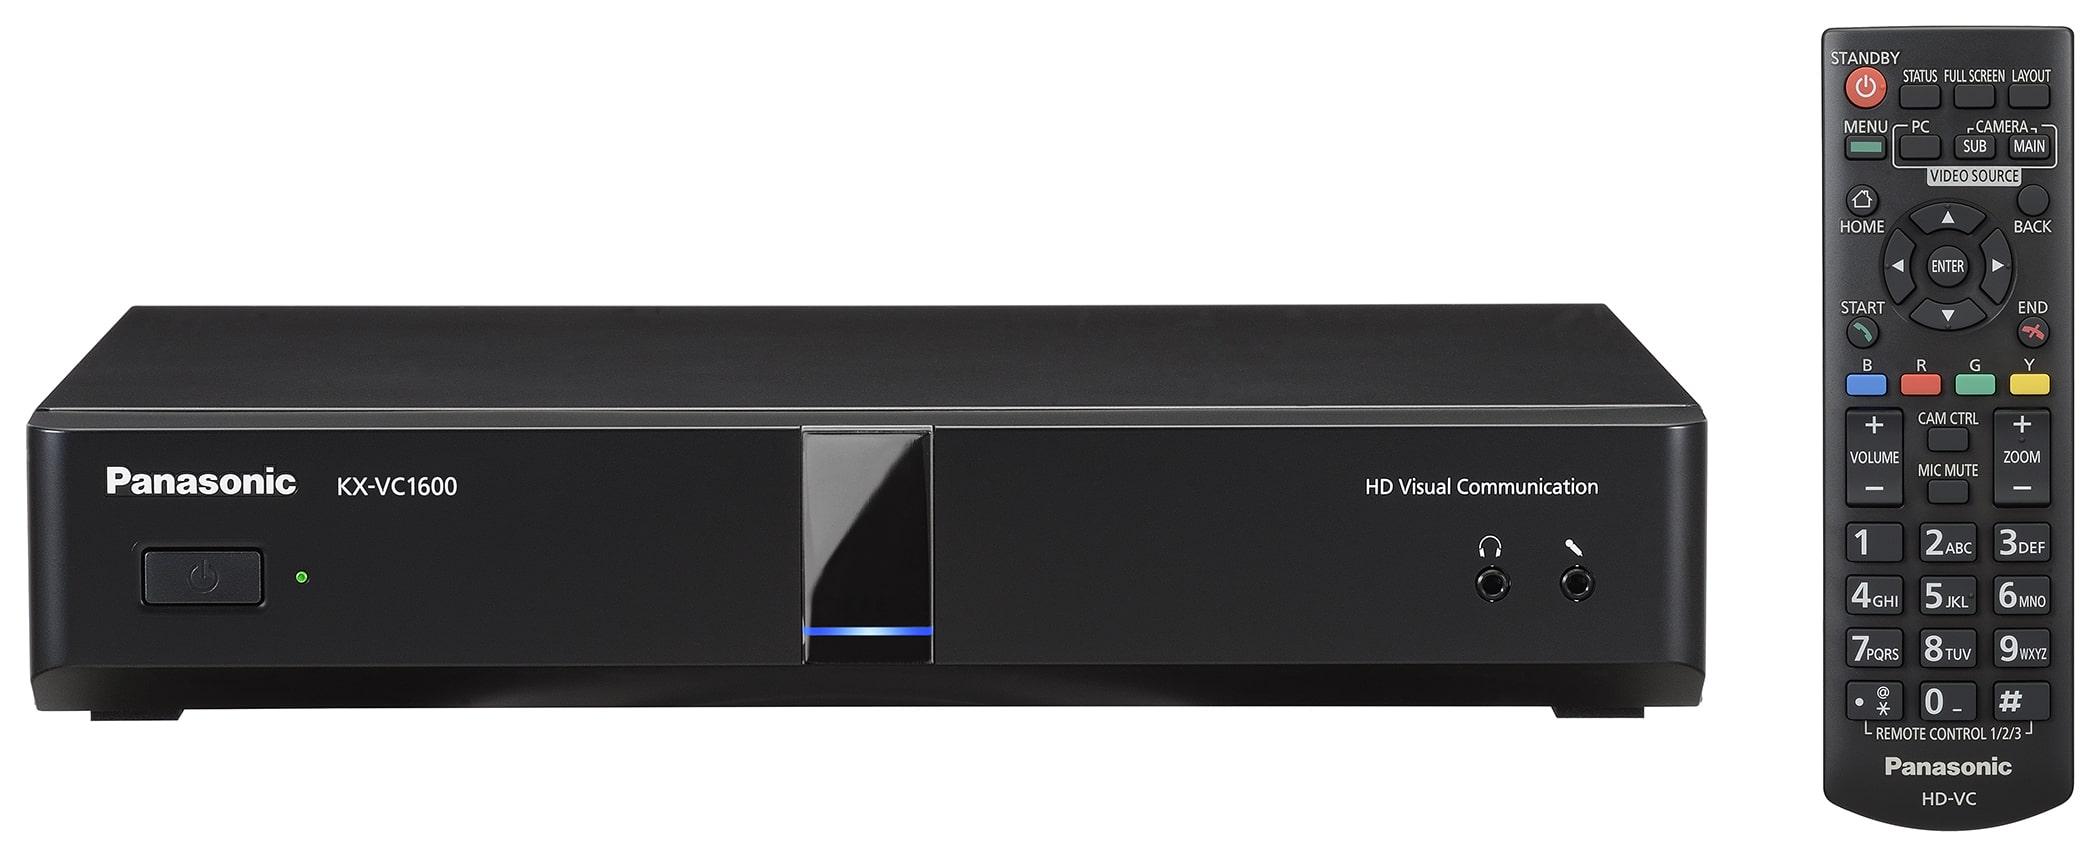 Panasonic KX-VC1600